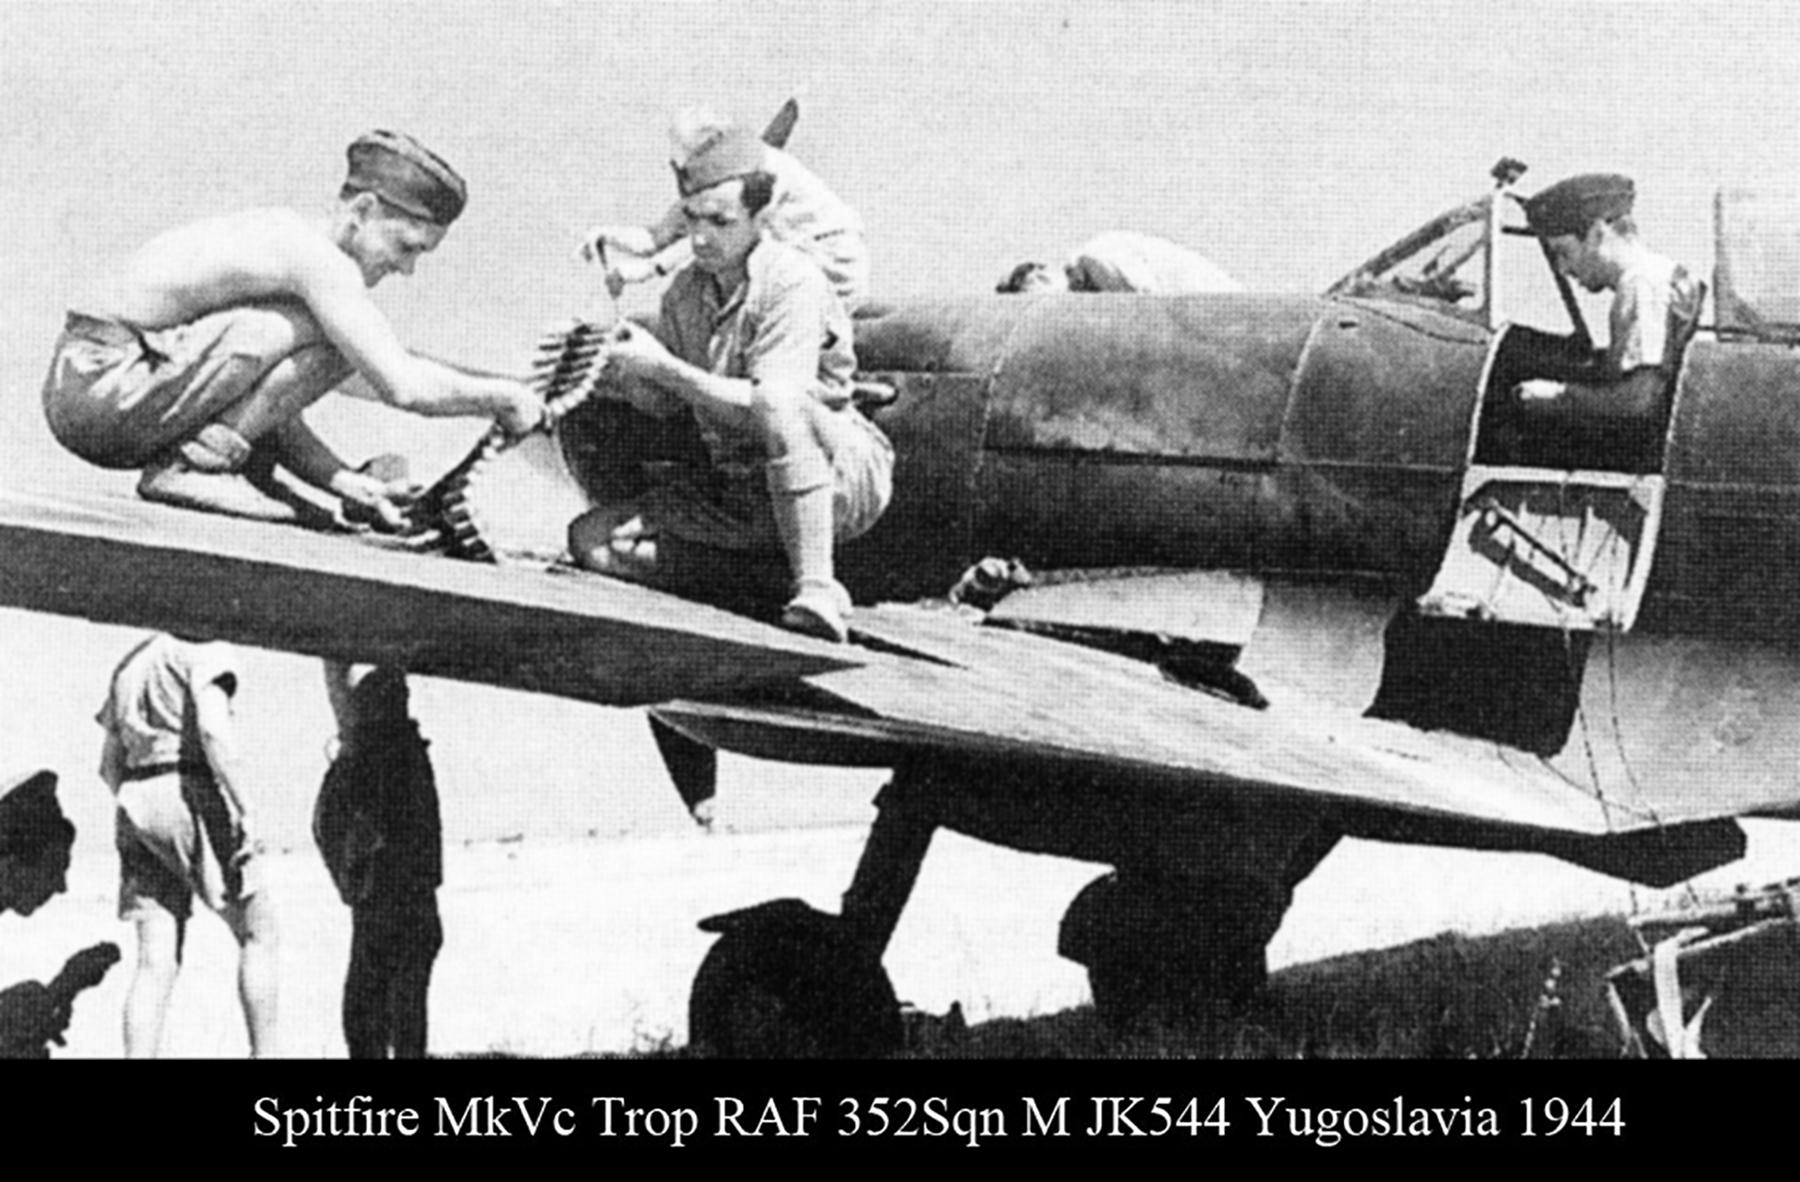 Spitfire MkVcTrop RAF 352Sqn M JK544 Yugoslavia Aug 1944 02